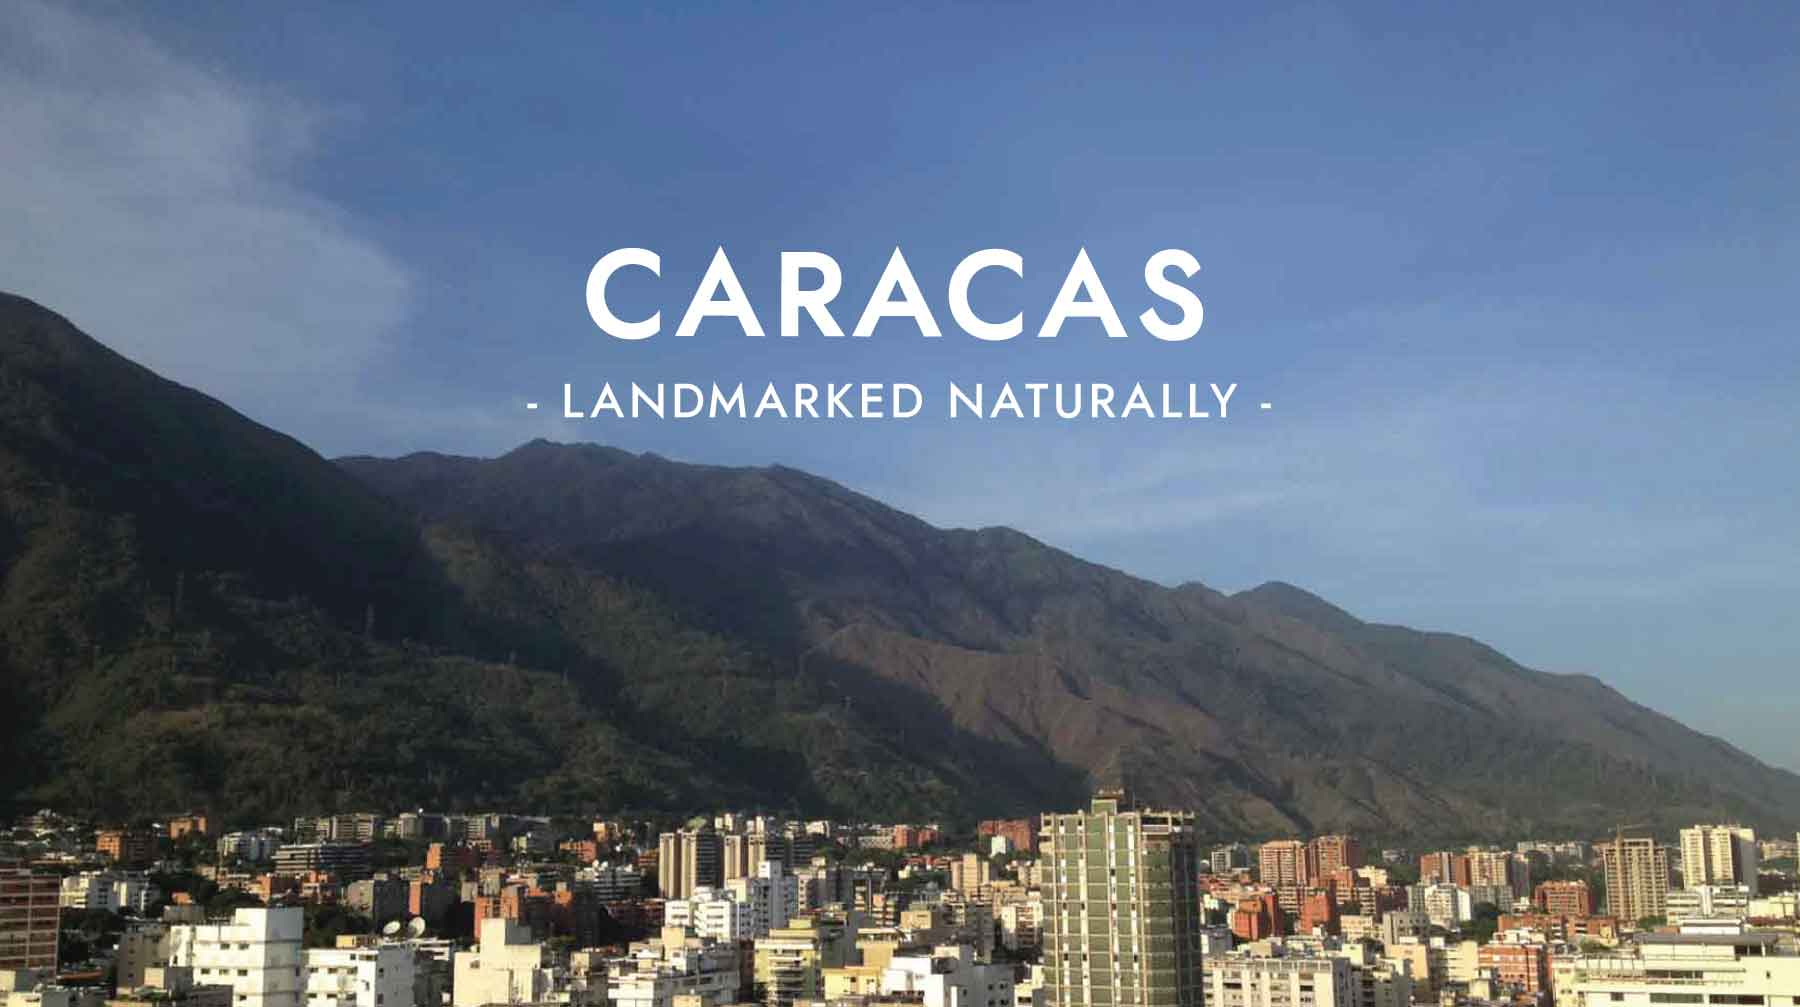 Caracas-Minimap-Landmarked-Naturally